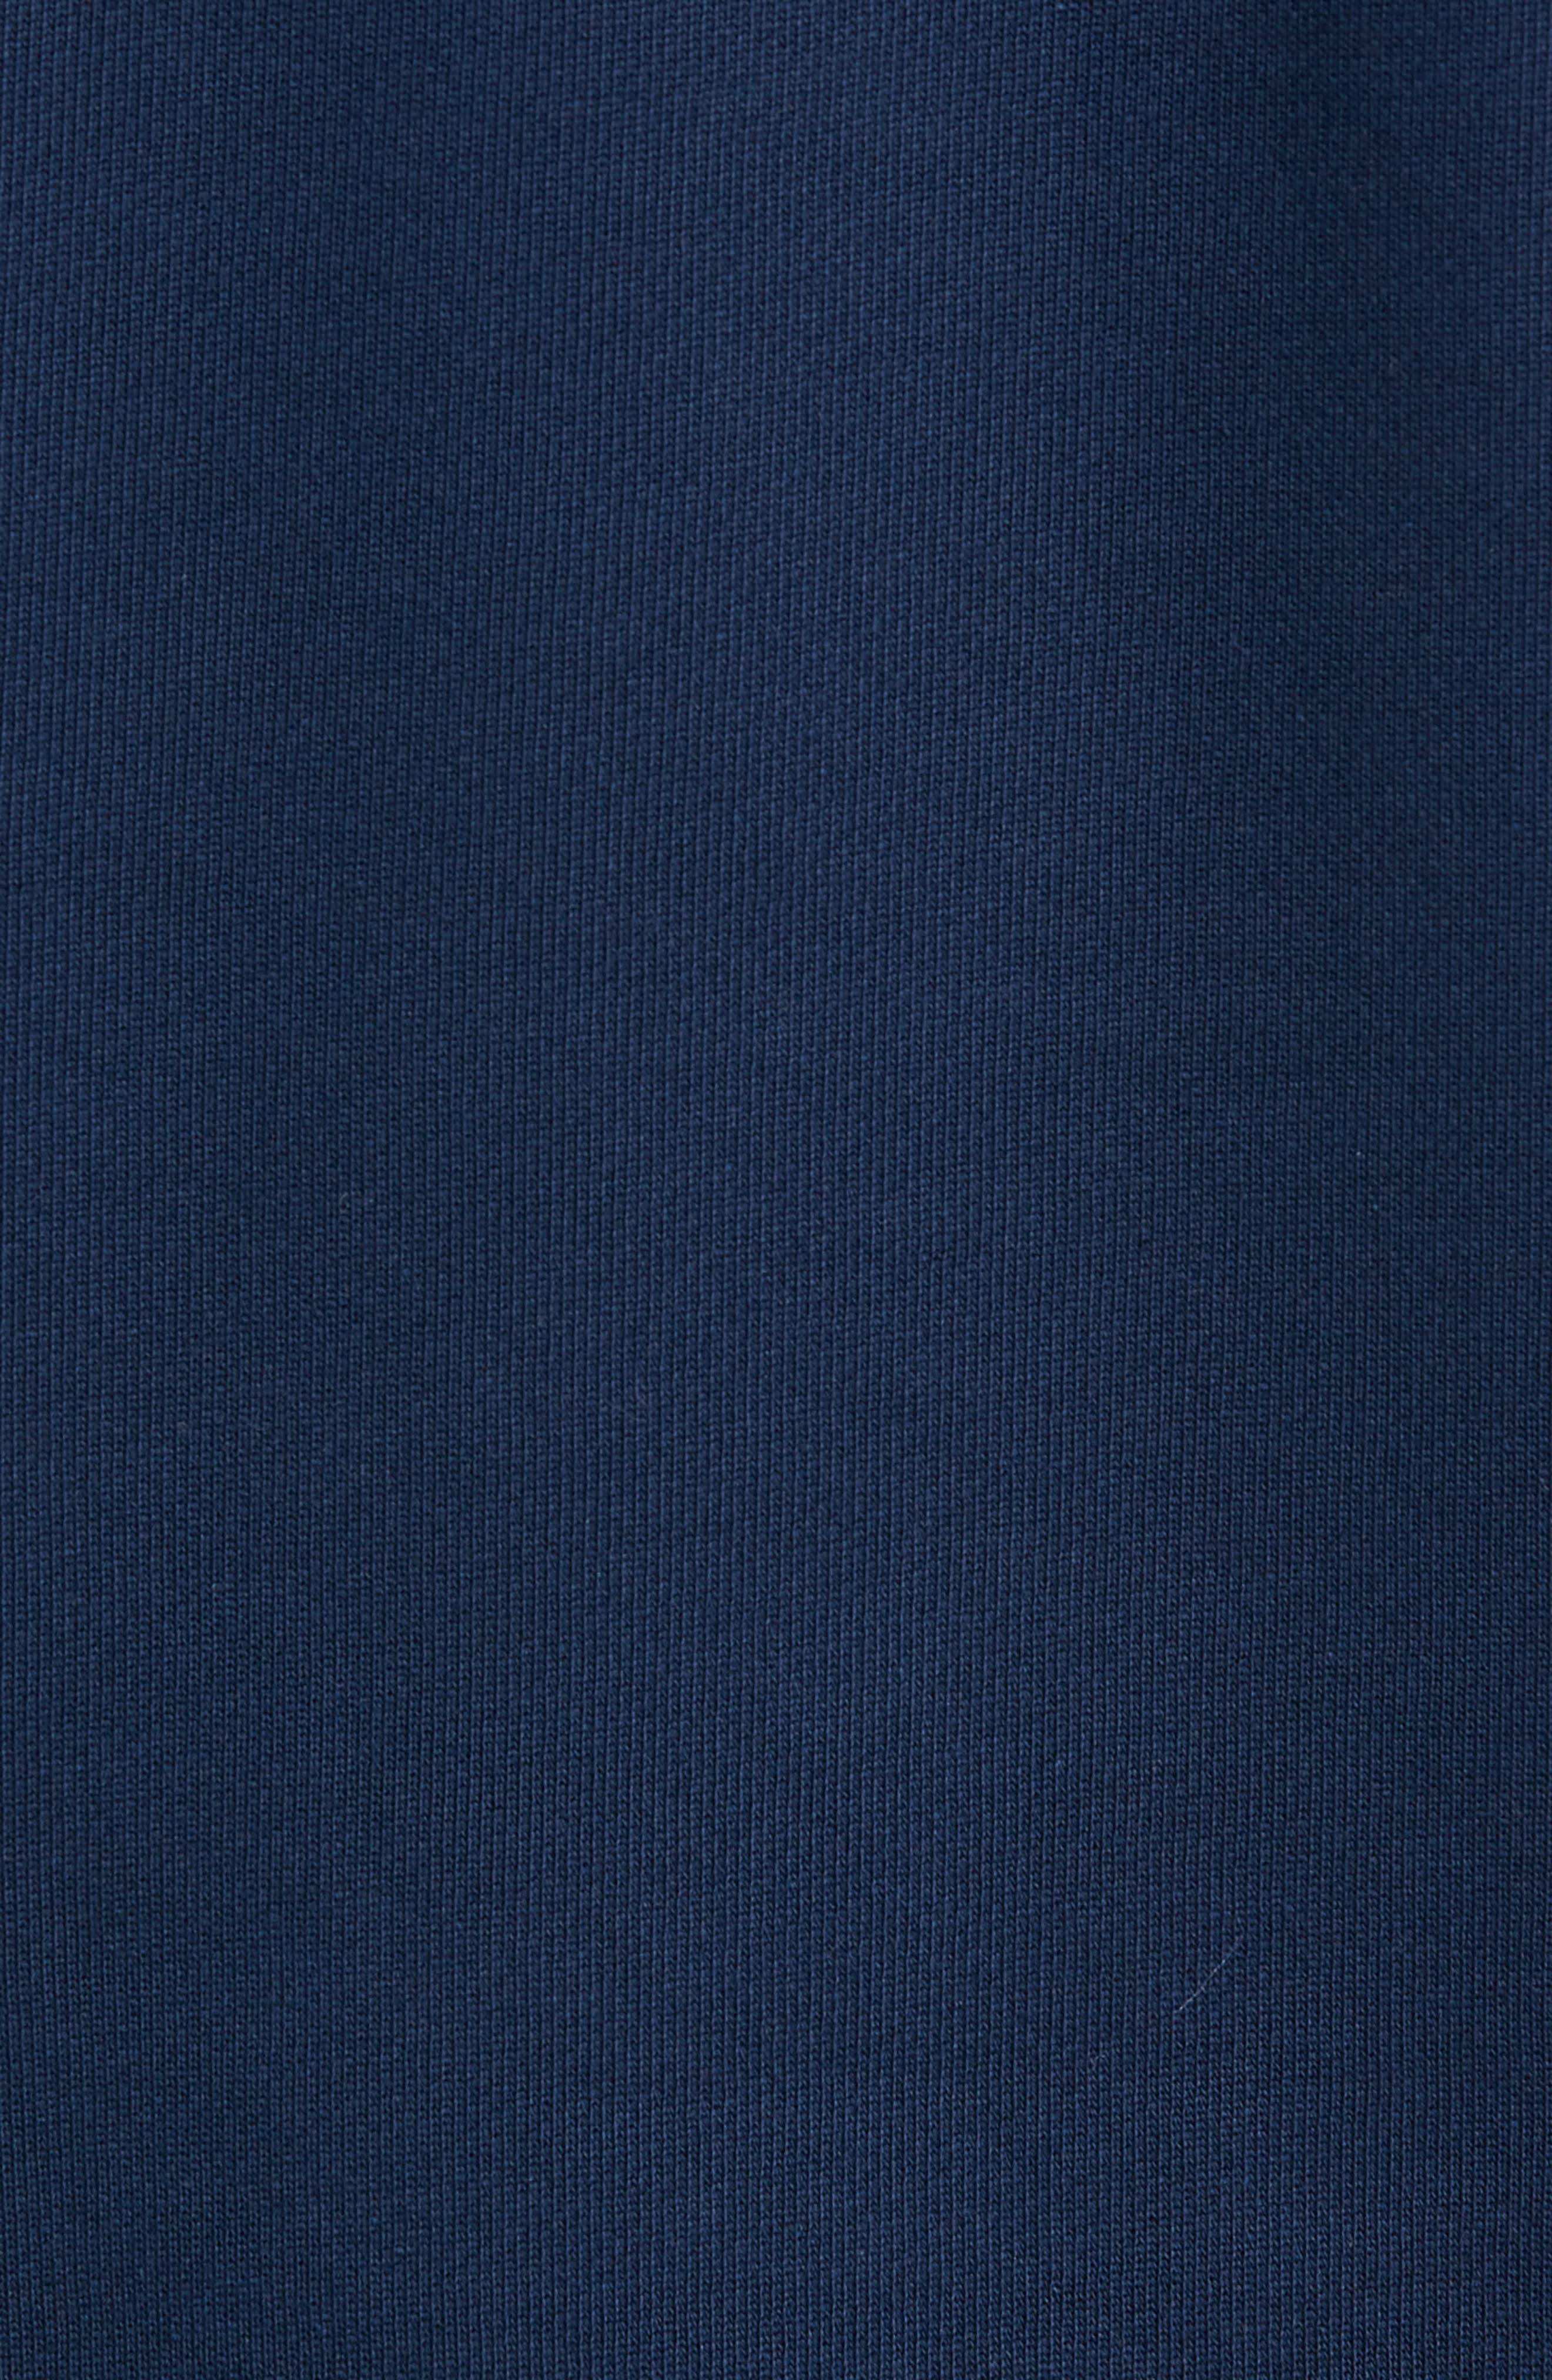 ADIDAS ORIGINALS, Camo Hooded Sweatshirt, Alternate thumbnail 5, color, COLLEGIATE NAVY